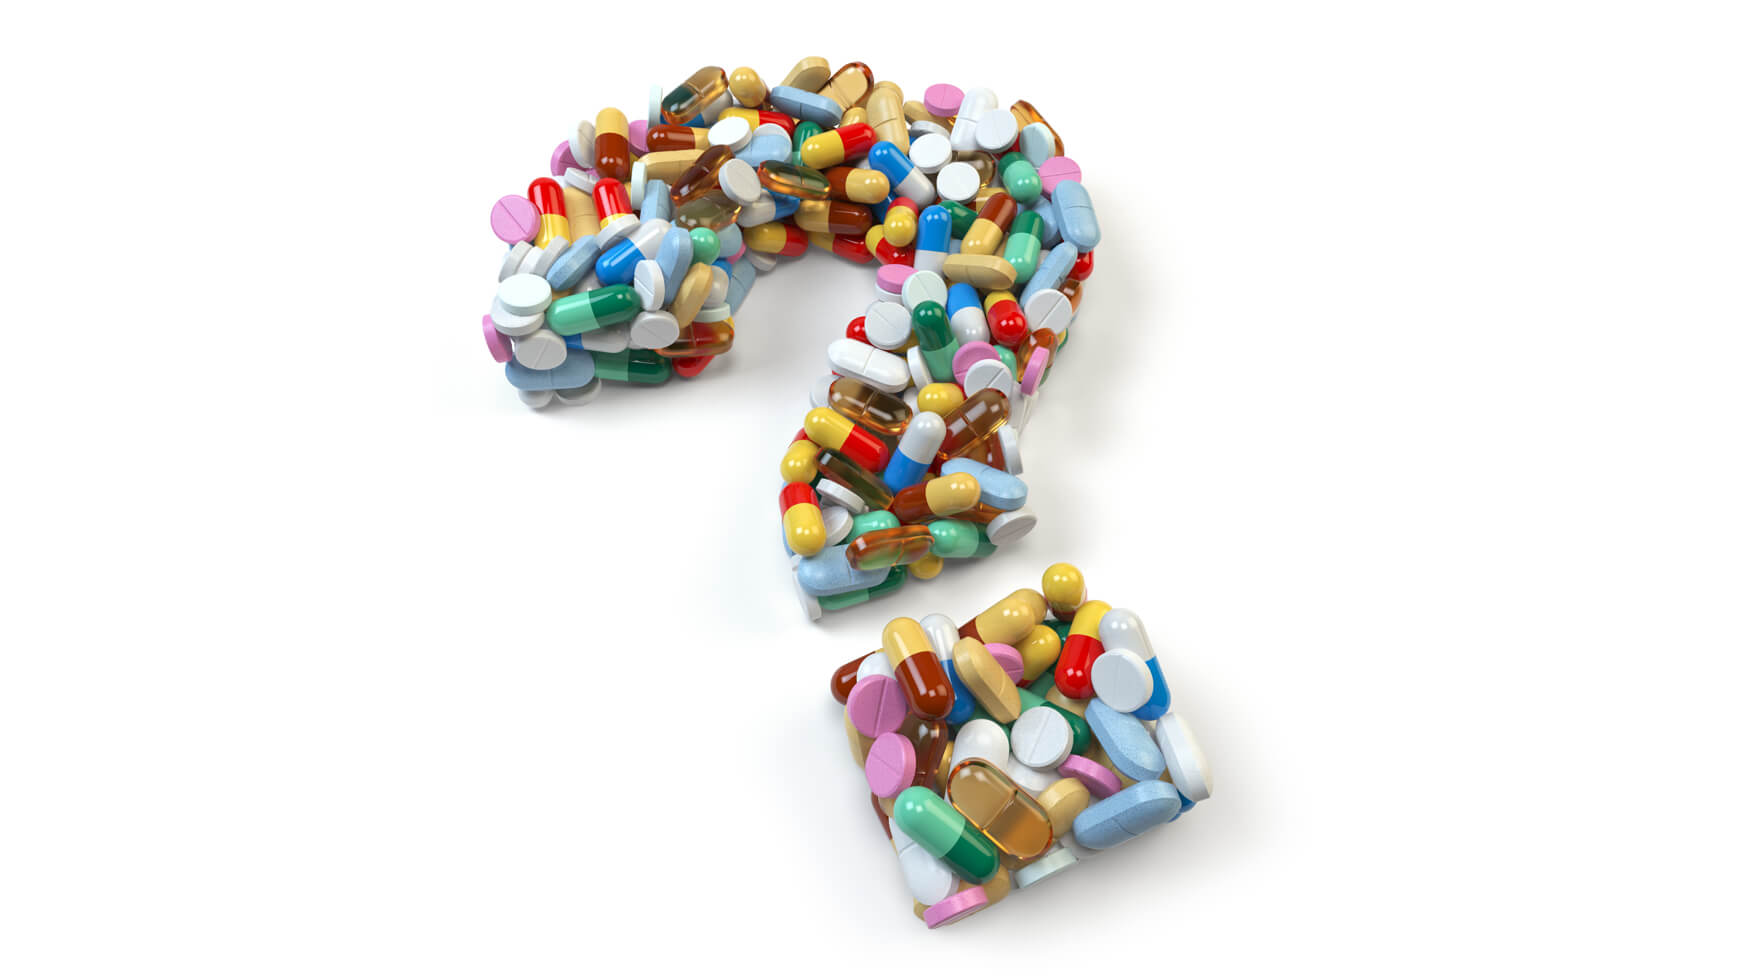 New York AG Tells Court Opioid Crisis Damage `Dwarfs` Drugmakers` Resources